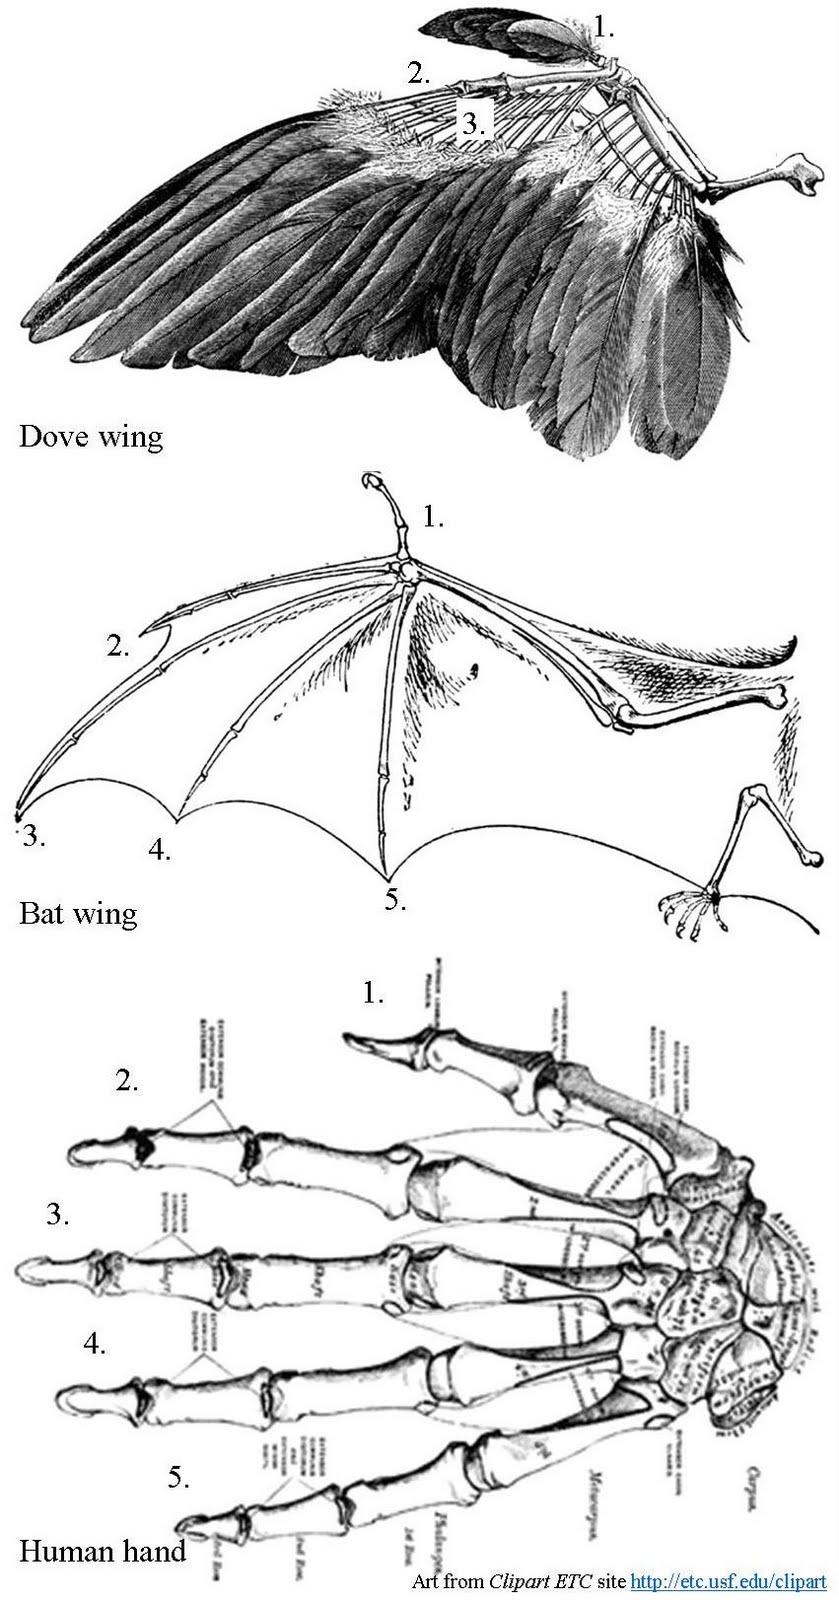 Wild Birds Unlimited: Do Birds Have Thumbs?